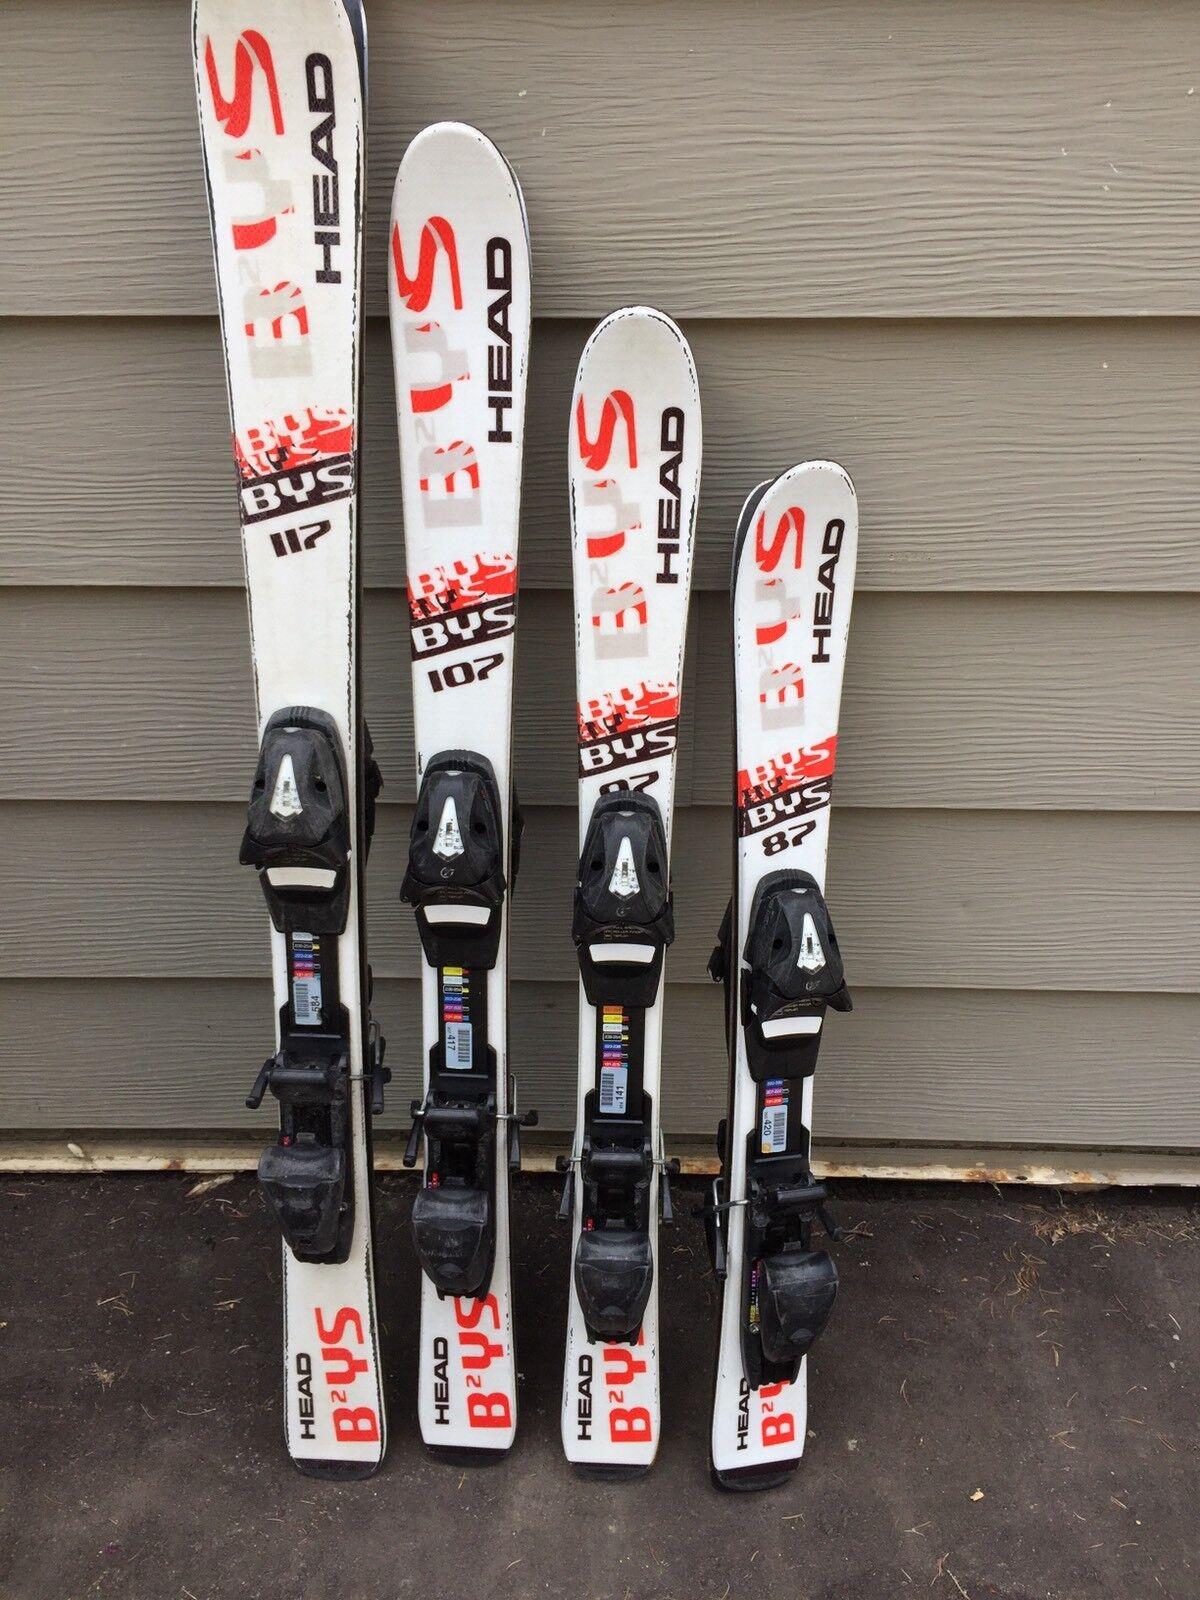 Head BYS junior skis   w Tyrolia SP4.5 Fully  Adjustable Demo Bindings  free shipping